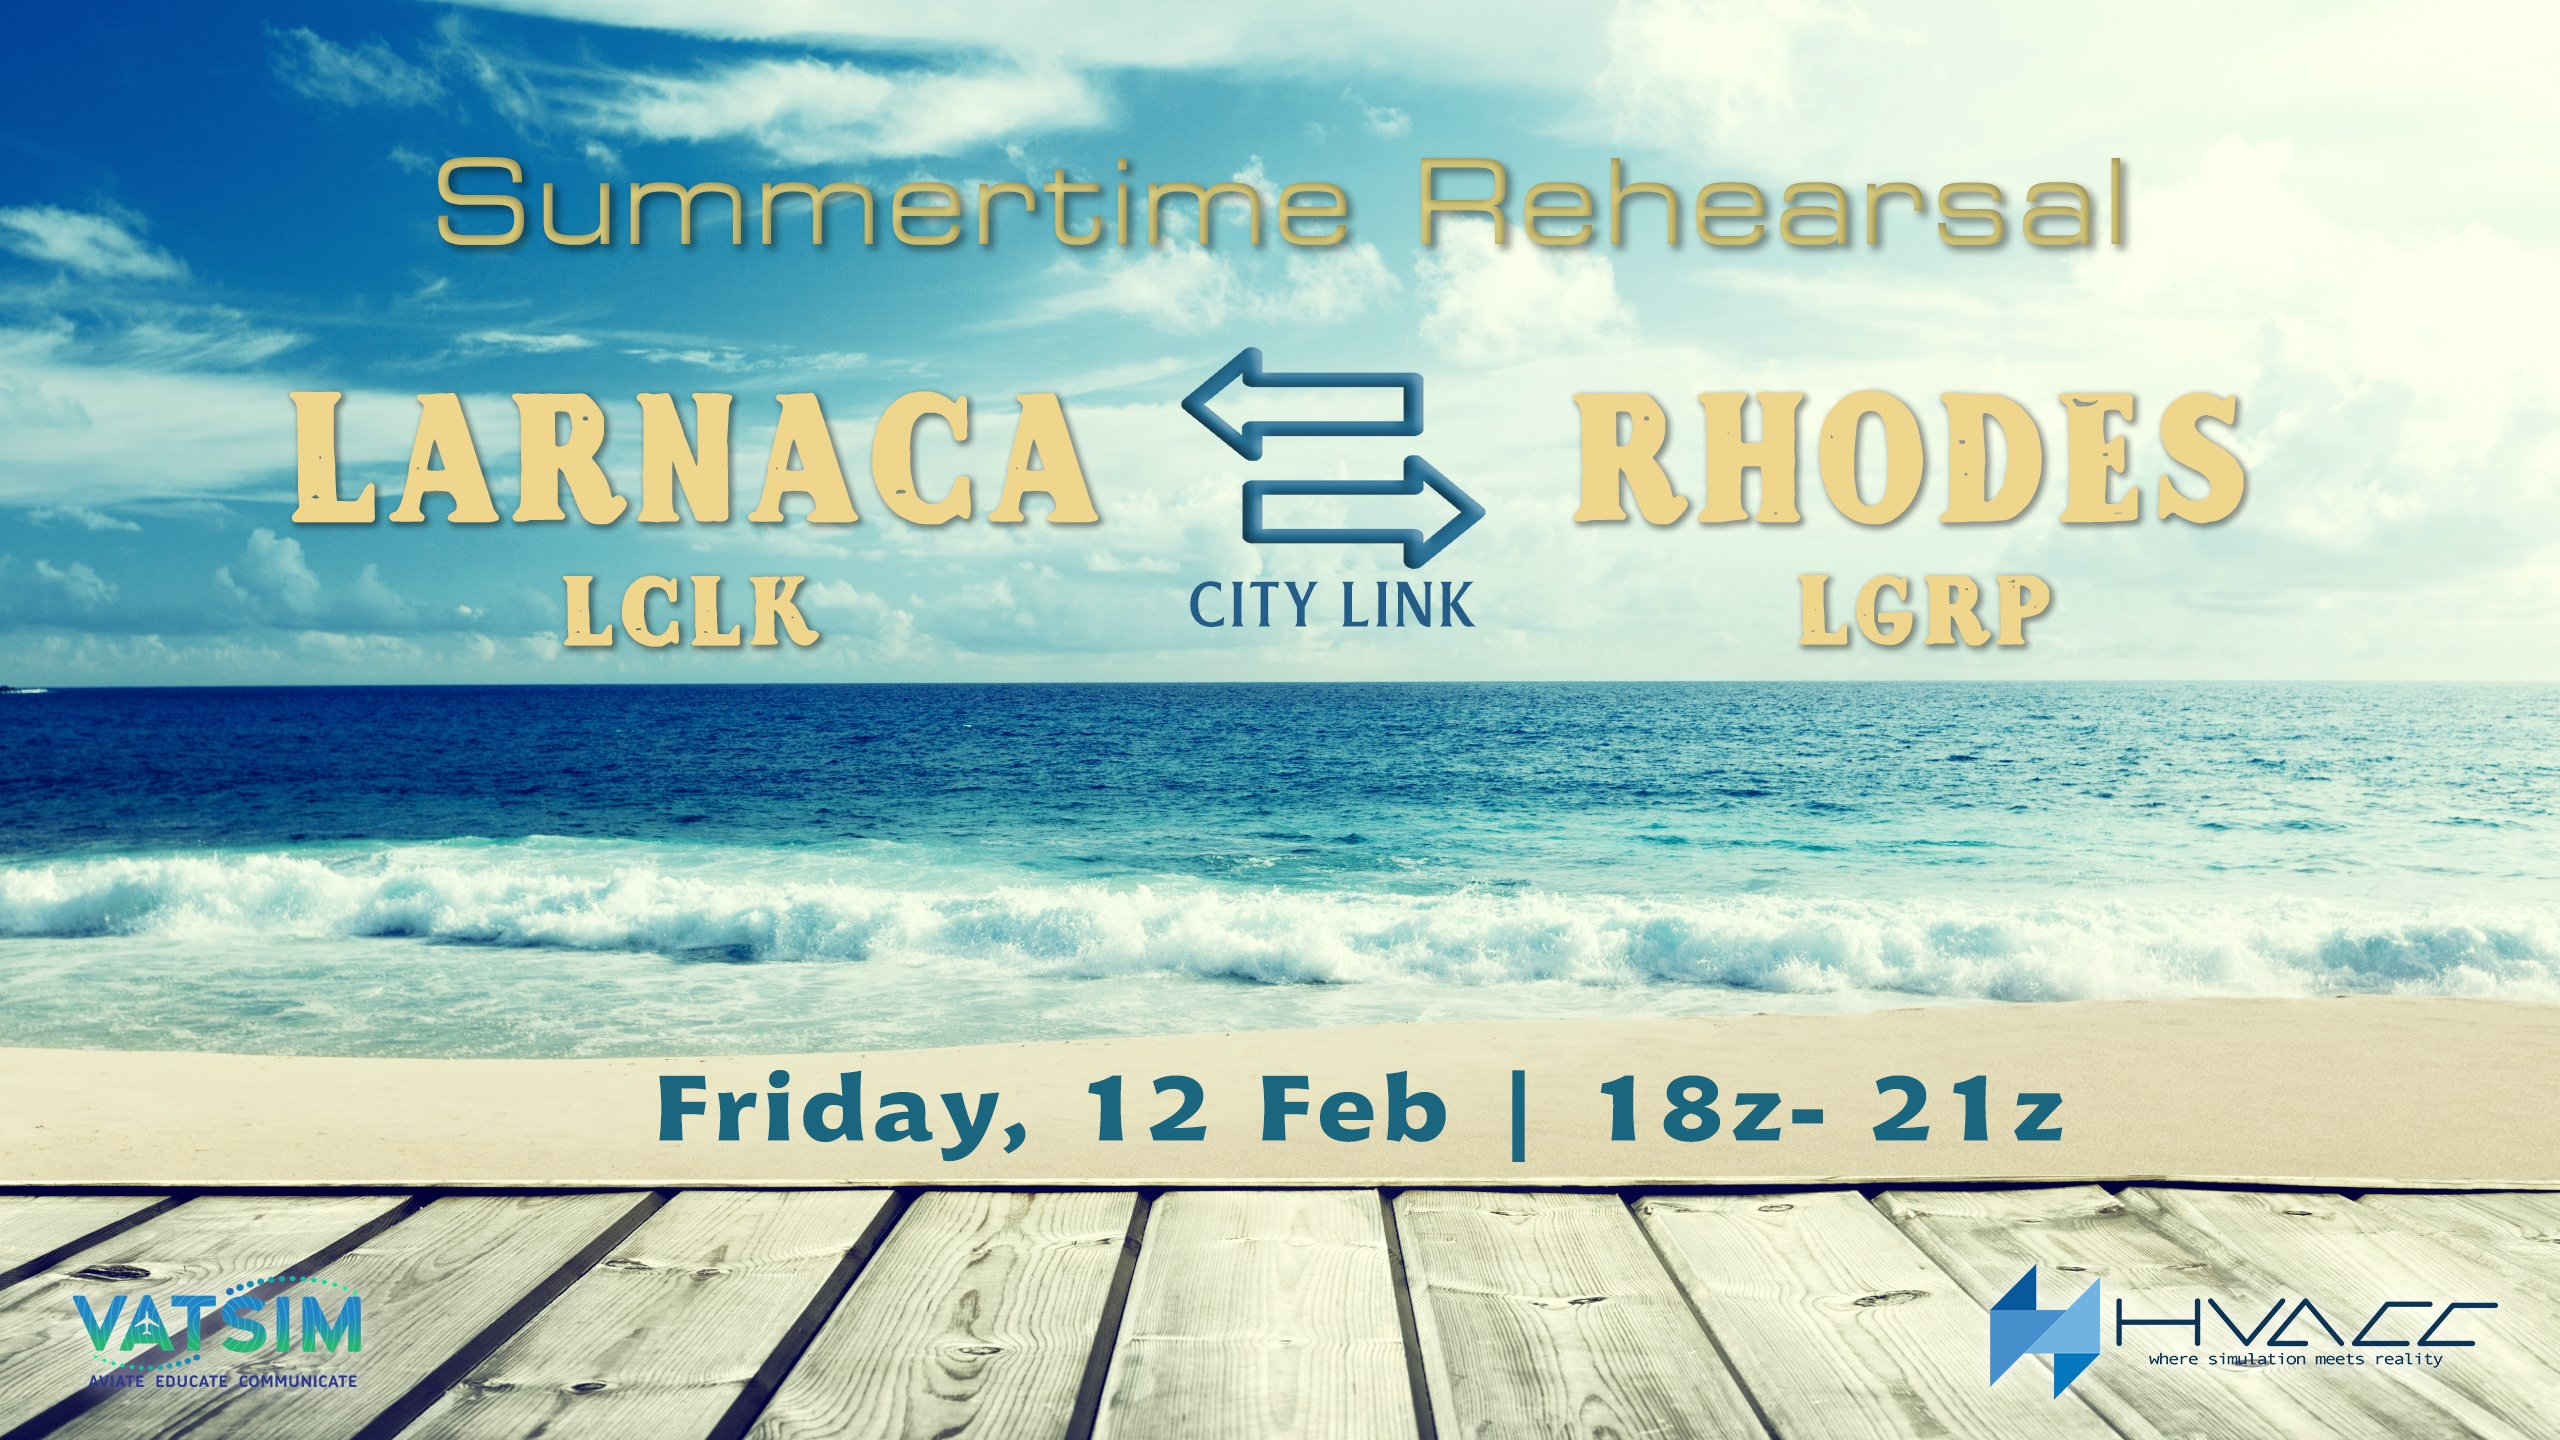 Larnaca - Rhodes City Link | Friday 12 Feb| 20:00 - 23:00 local